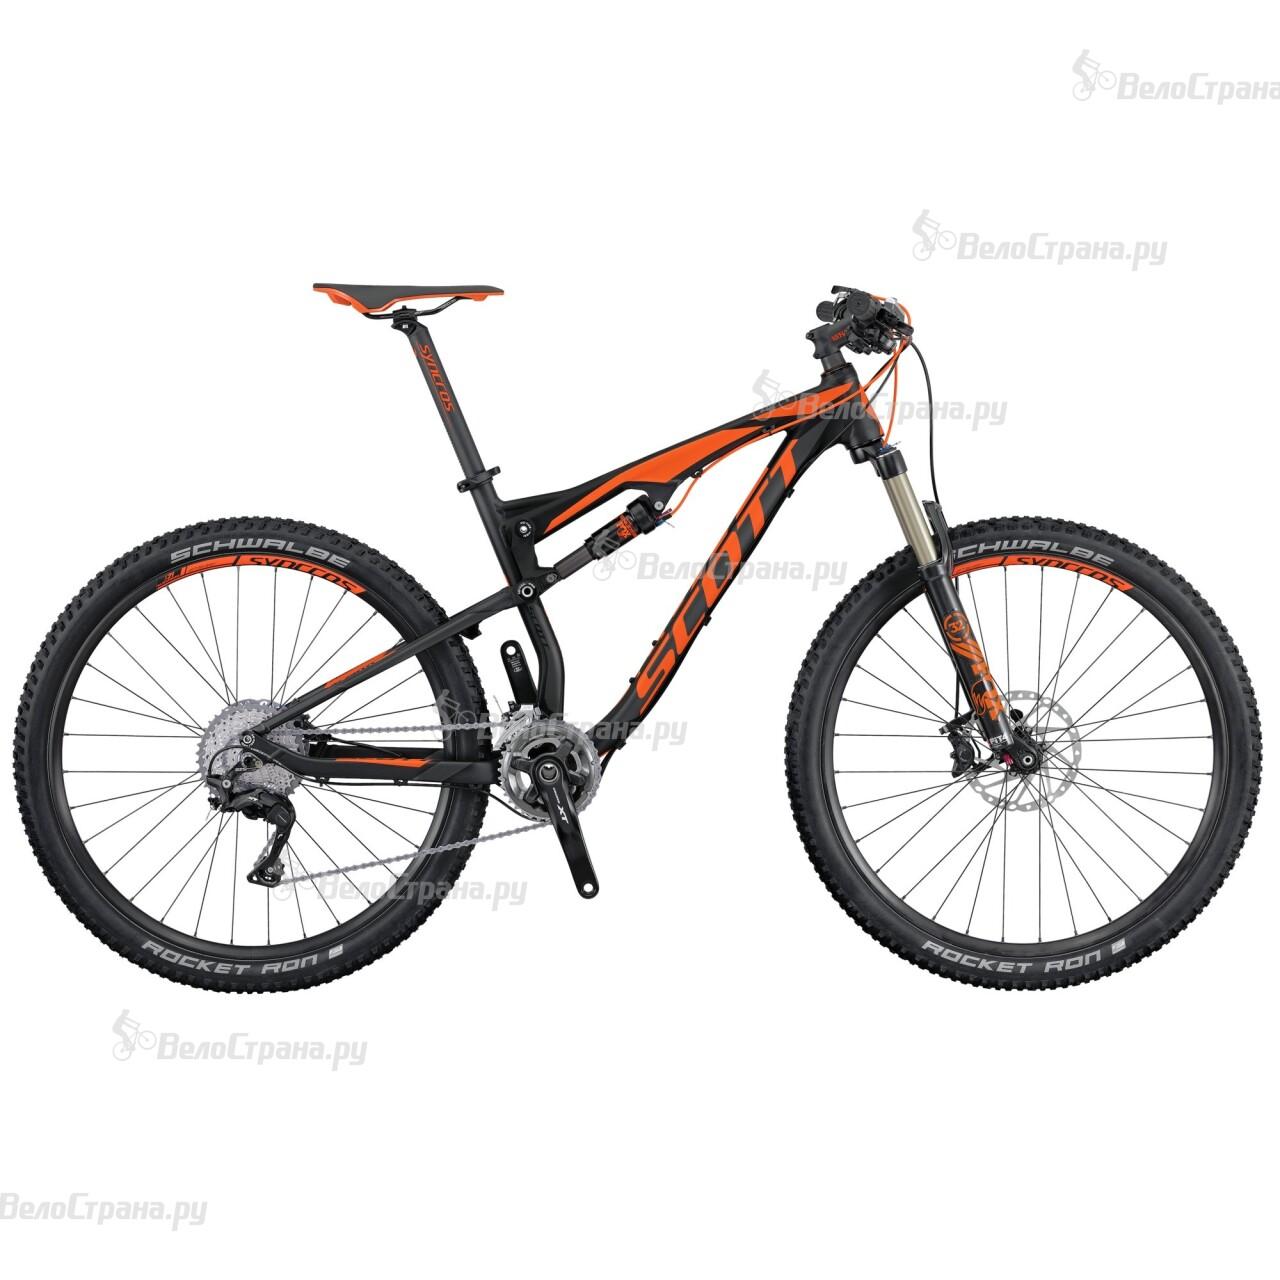 Велосипед Scott Spark 940 (2016) scott spark 750 2017